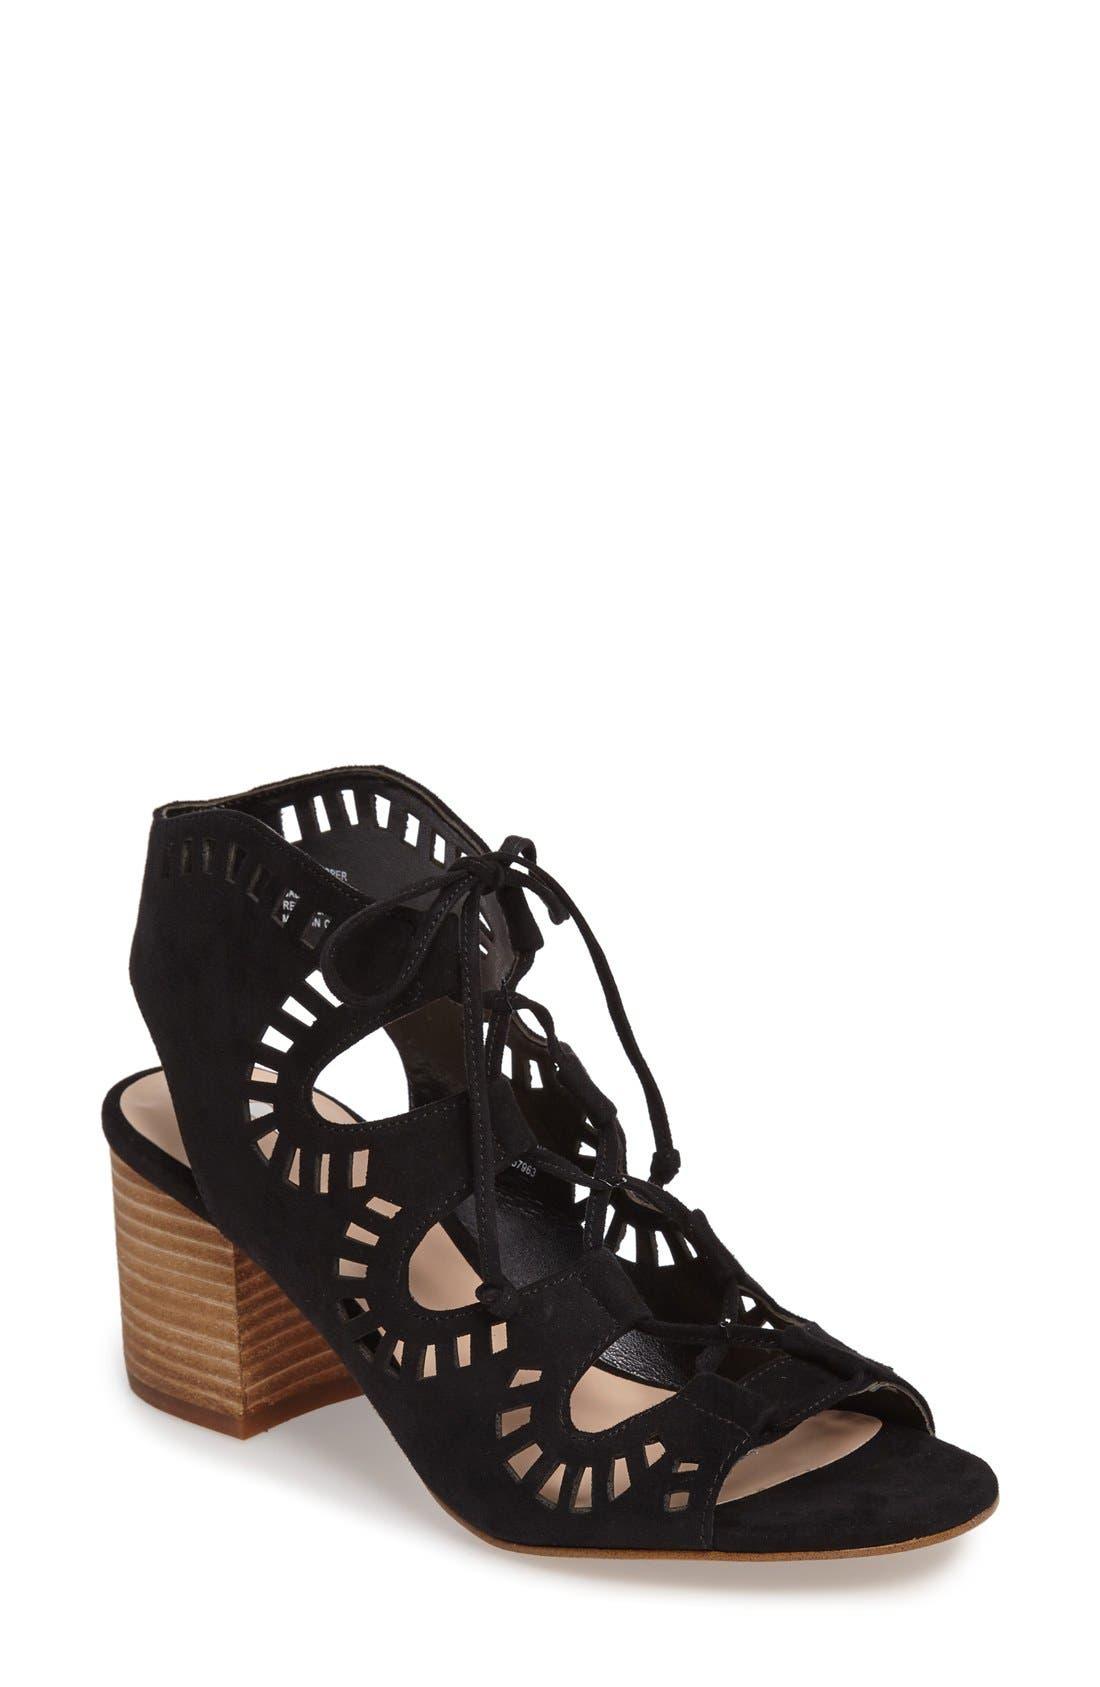 Alternate Image 1 Selected - BP. Decker Lace-Up Sandal (Women)